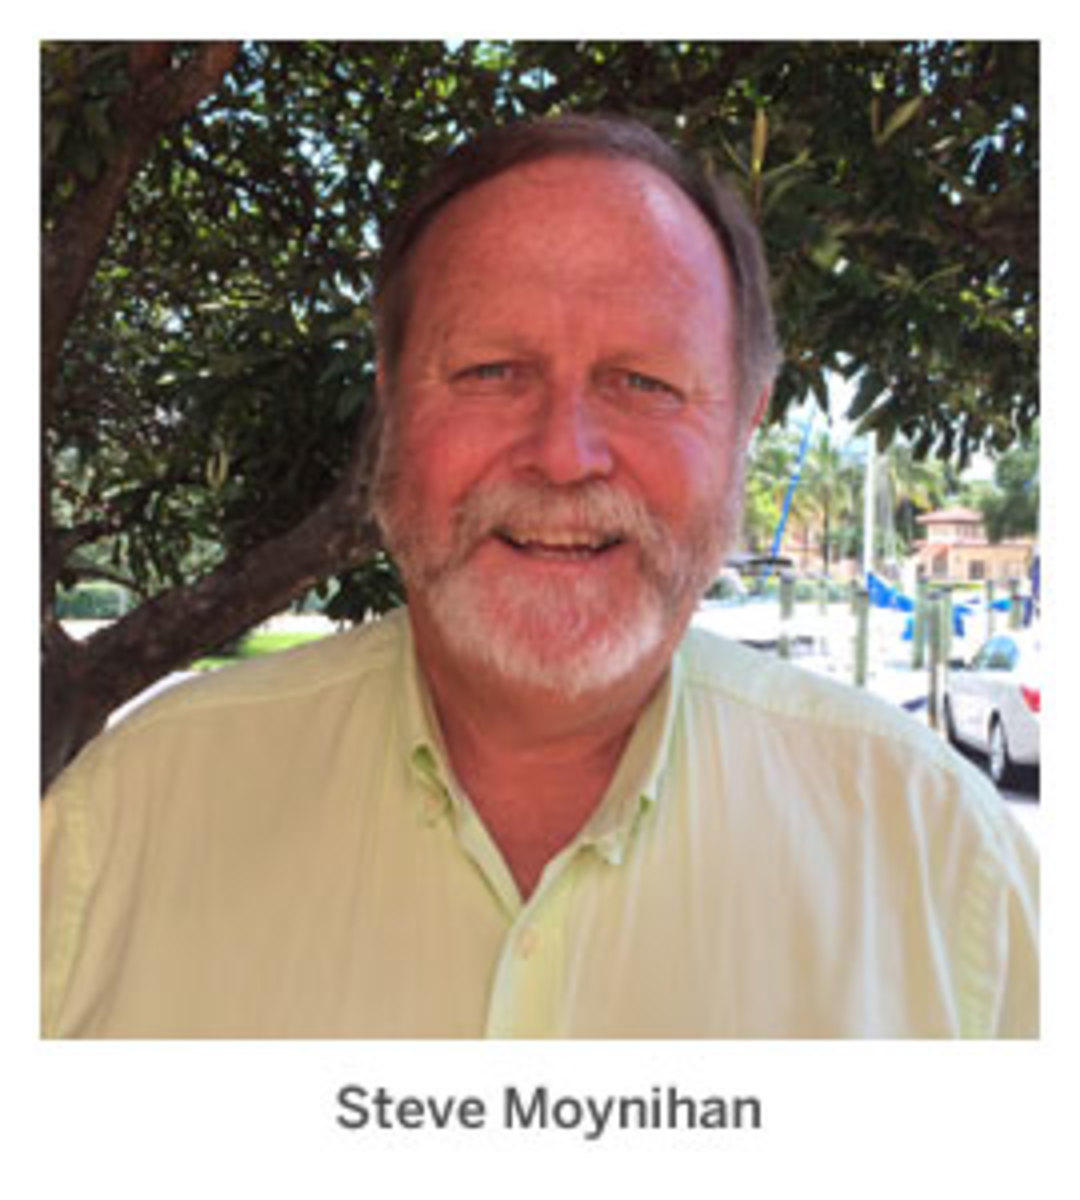 Steve Moynihan, founder and president, HMY